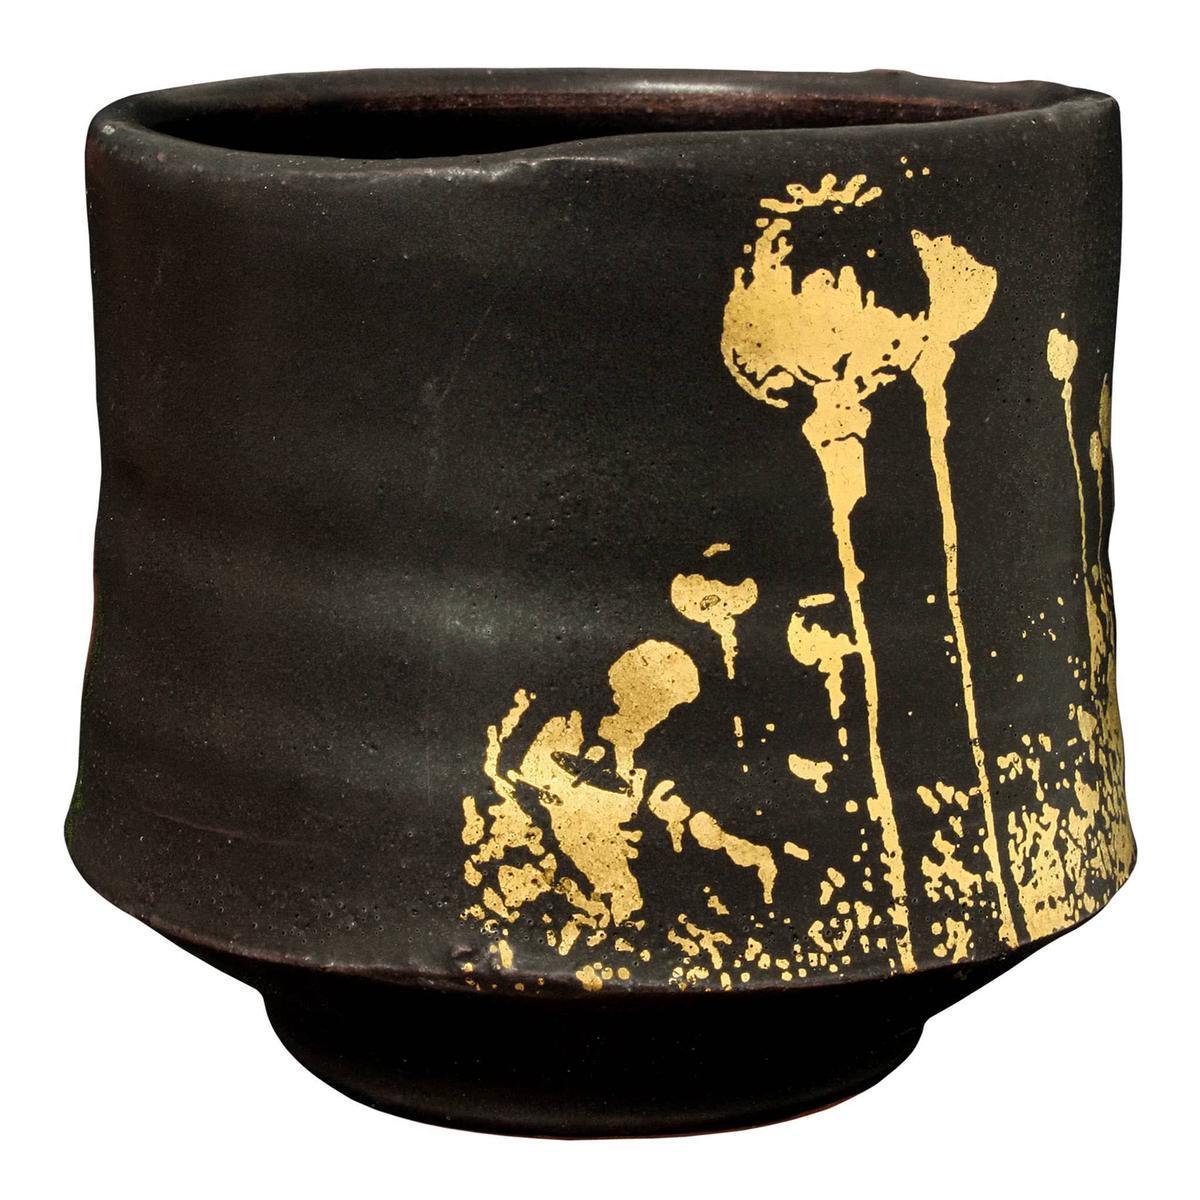 venta de esmalte para cerámica amaco Low Fire Matt Lm-1 satin black baja temperatura